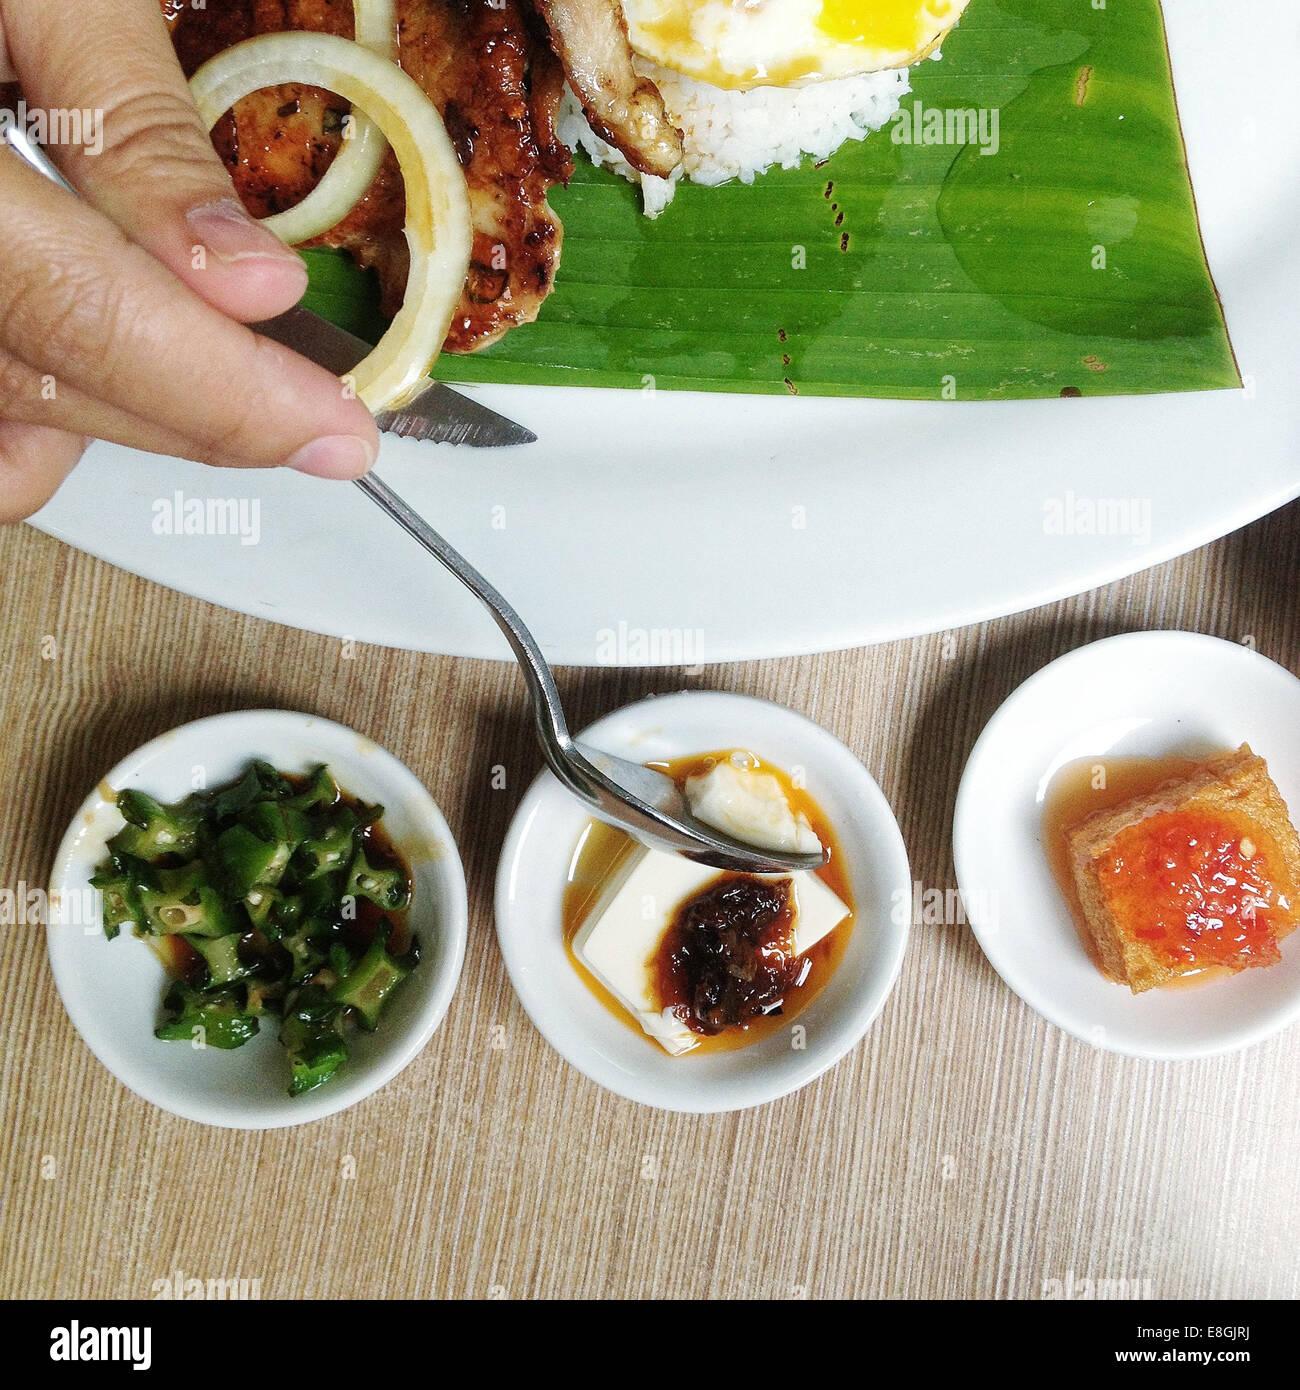 Malasia, Kuala Lumpur, tradicional comida asiática Imagen De Stock